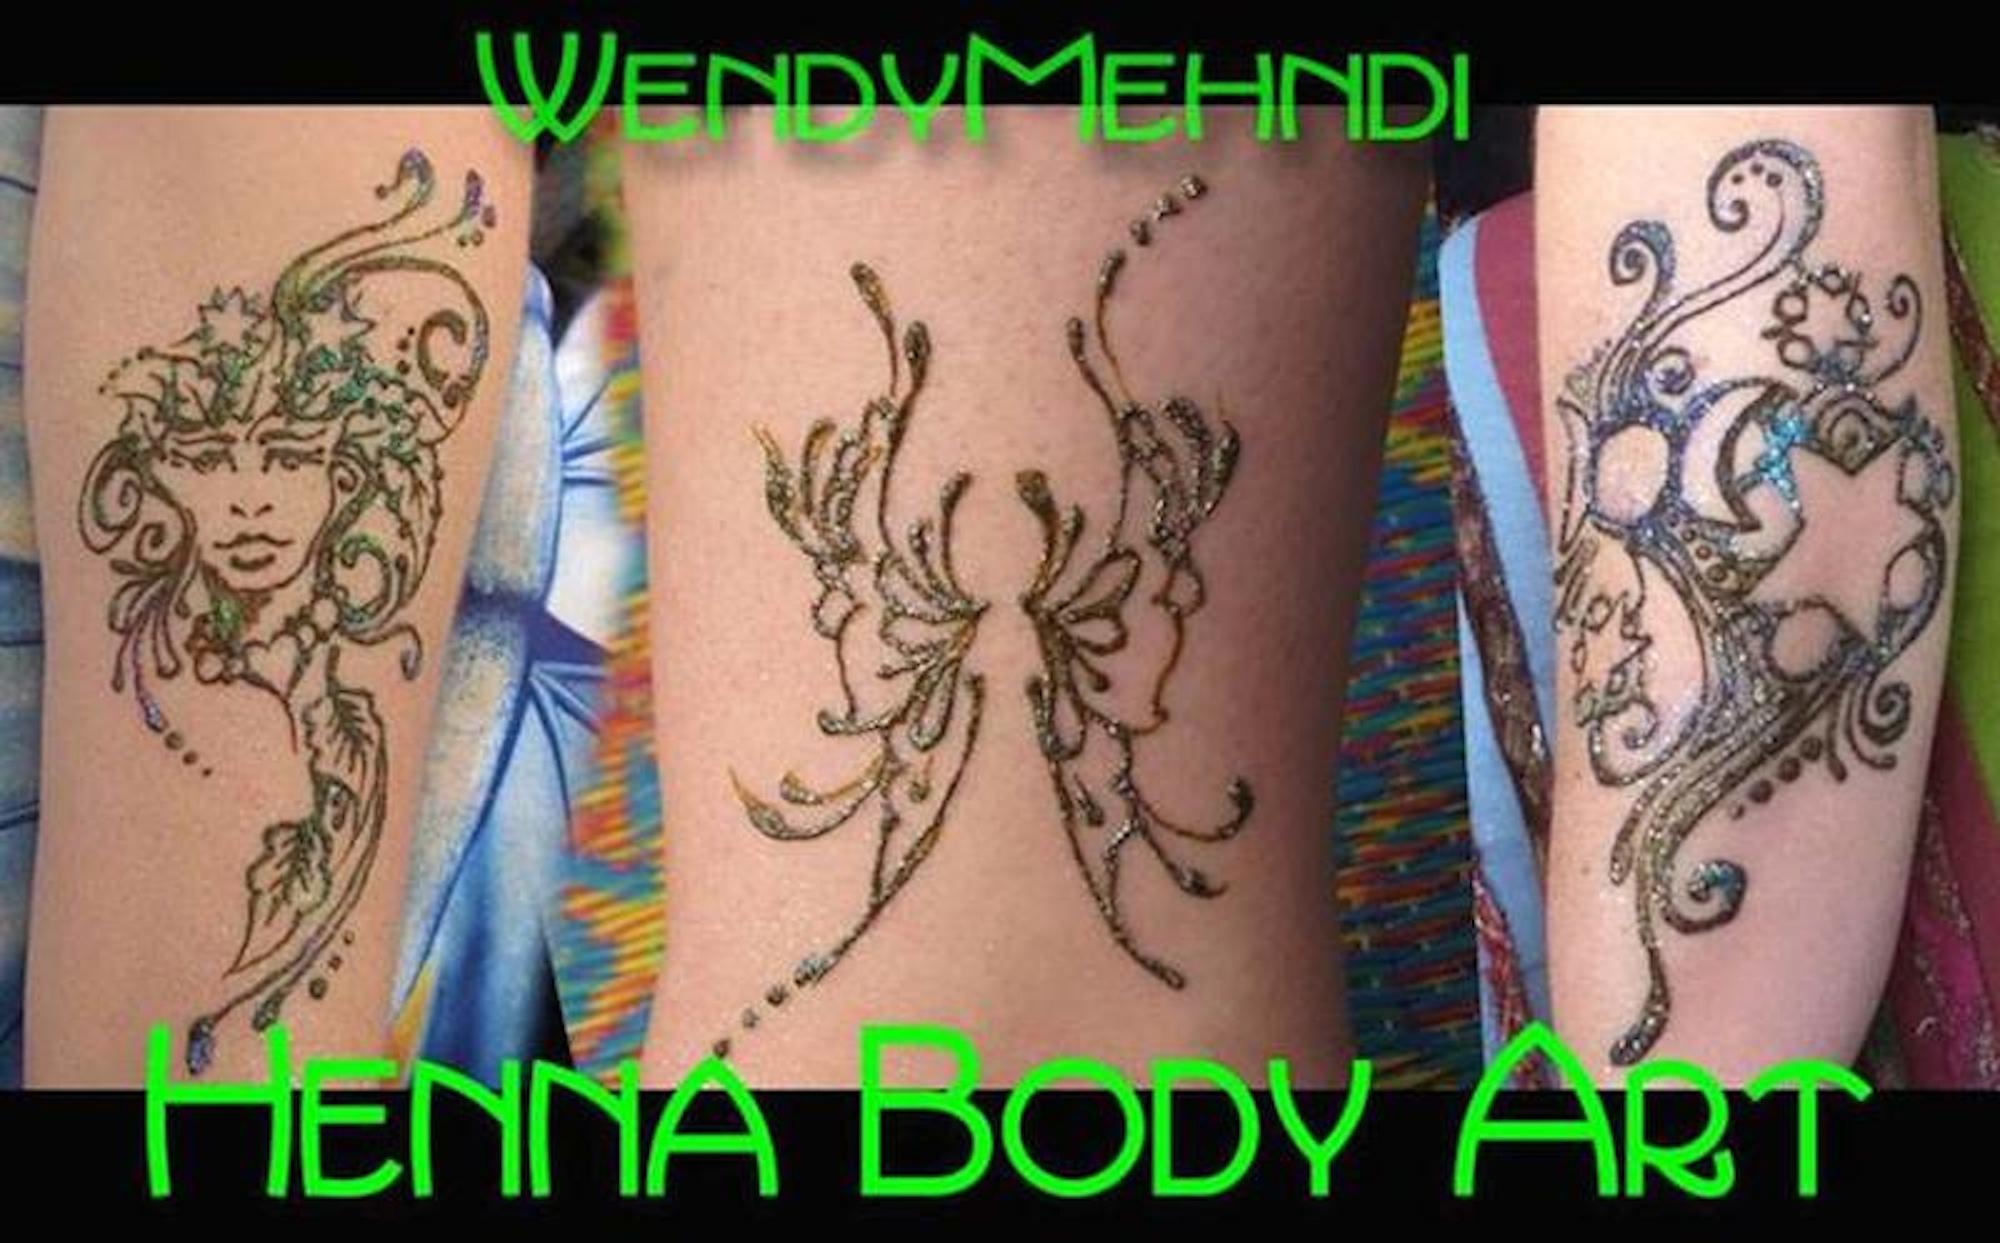 WendyMehndi.com